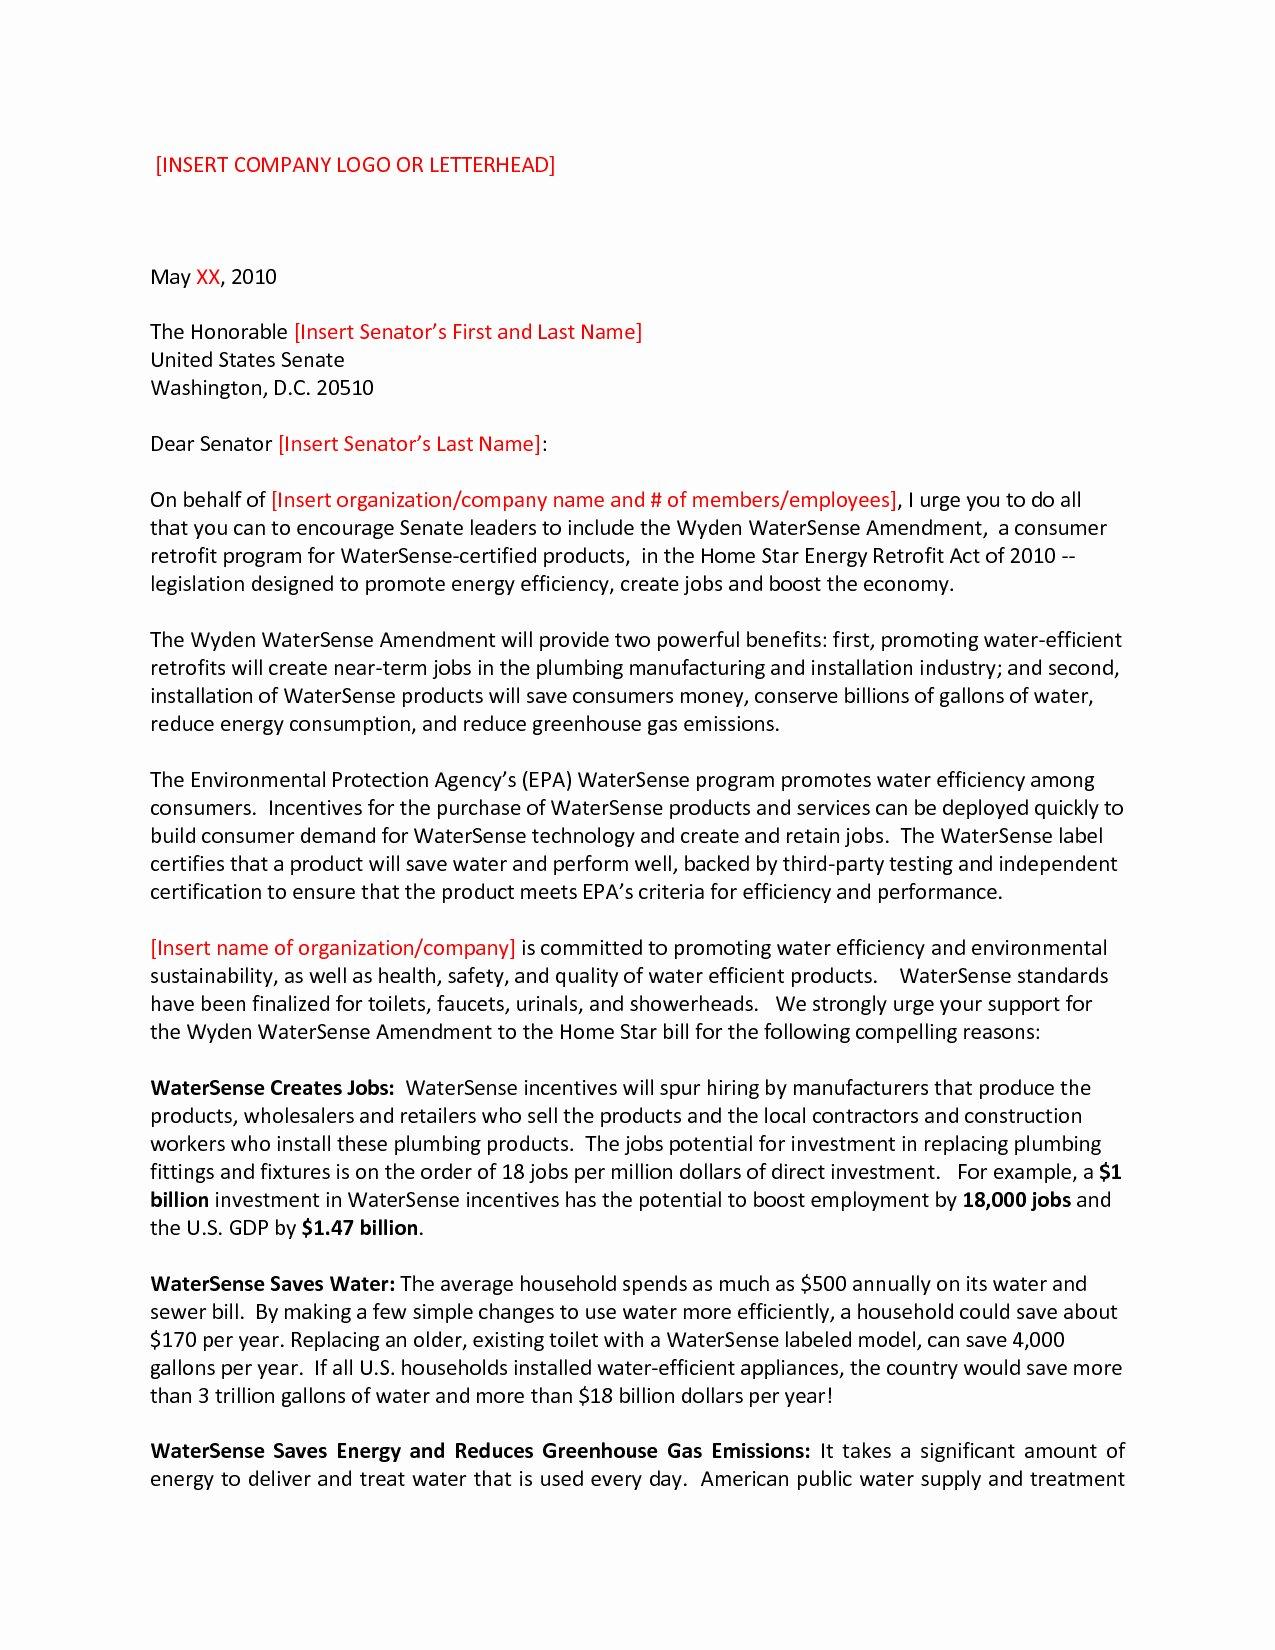 Letter to Congressman format Unique Letter to Senator Template Samples